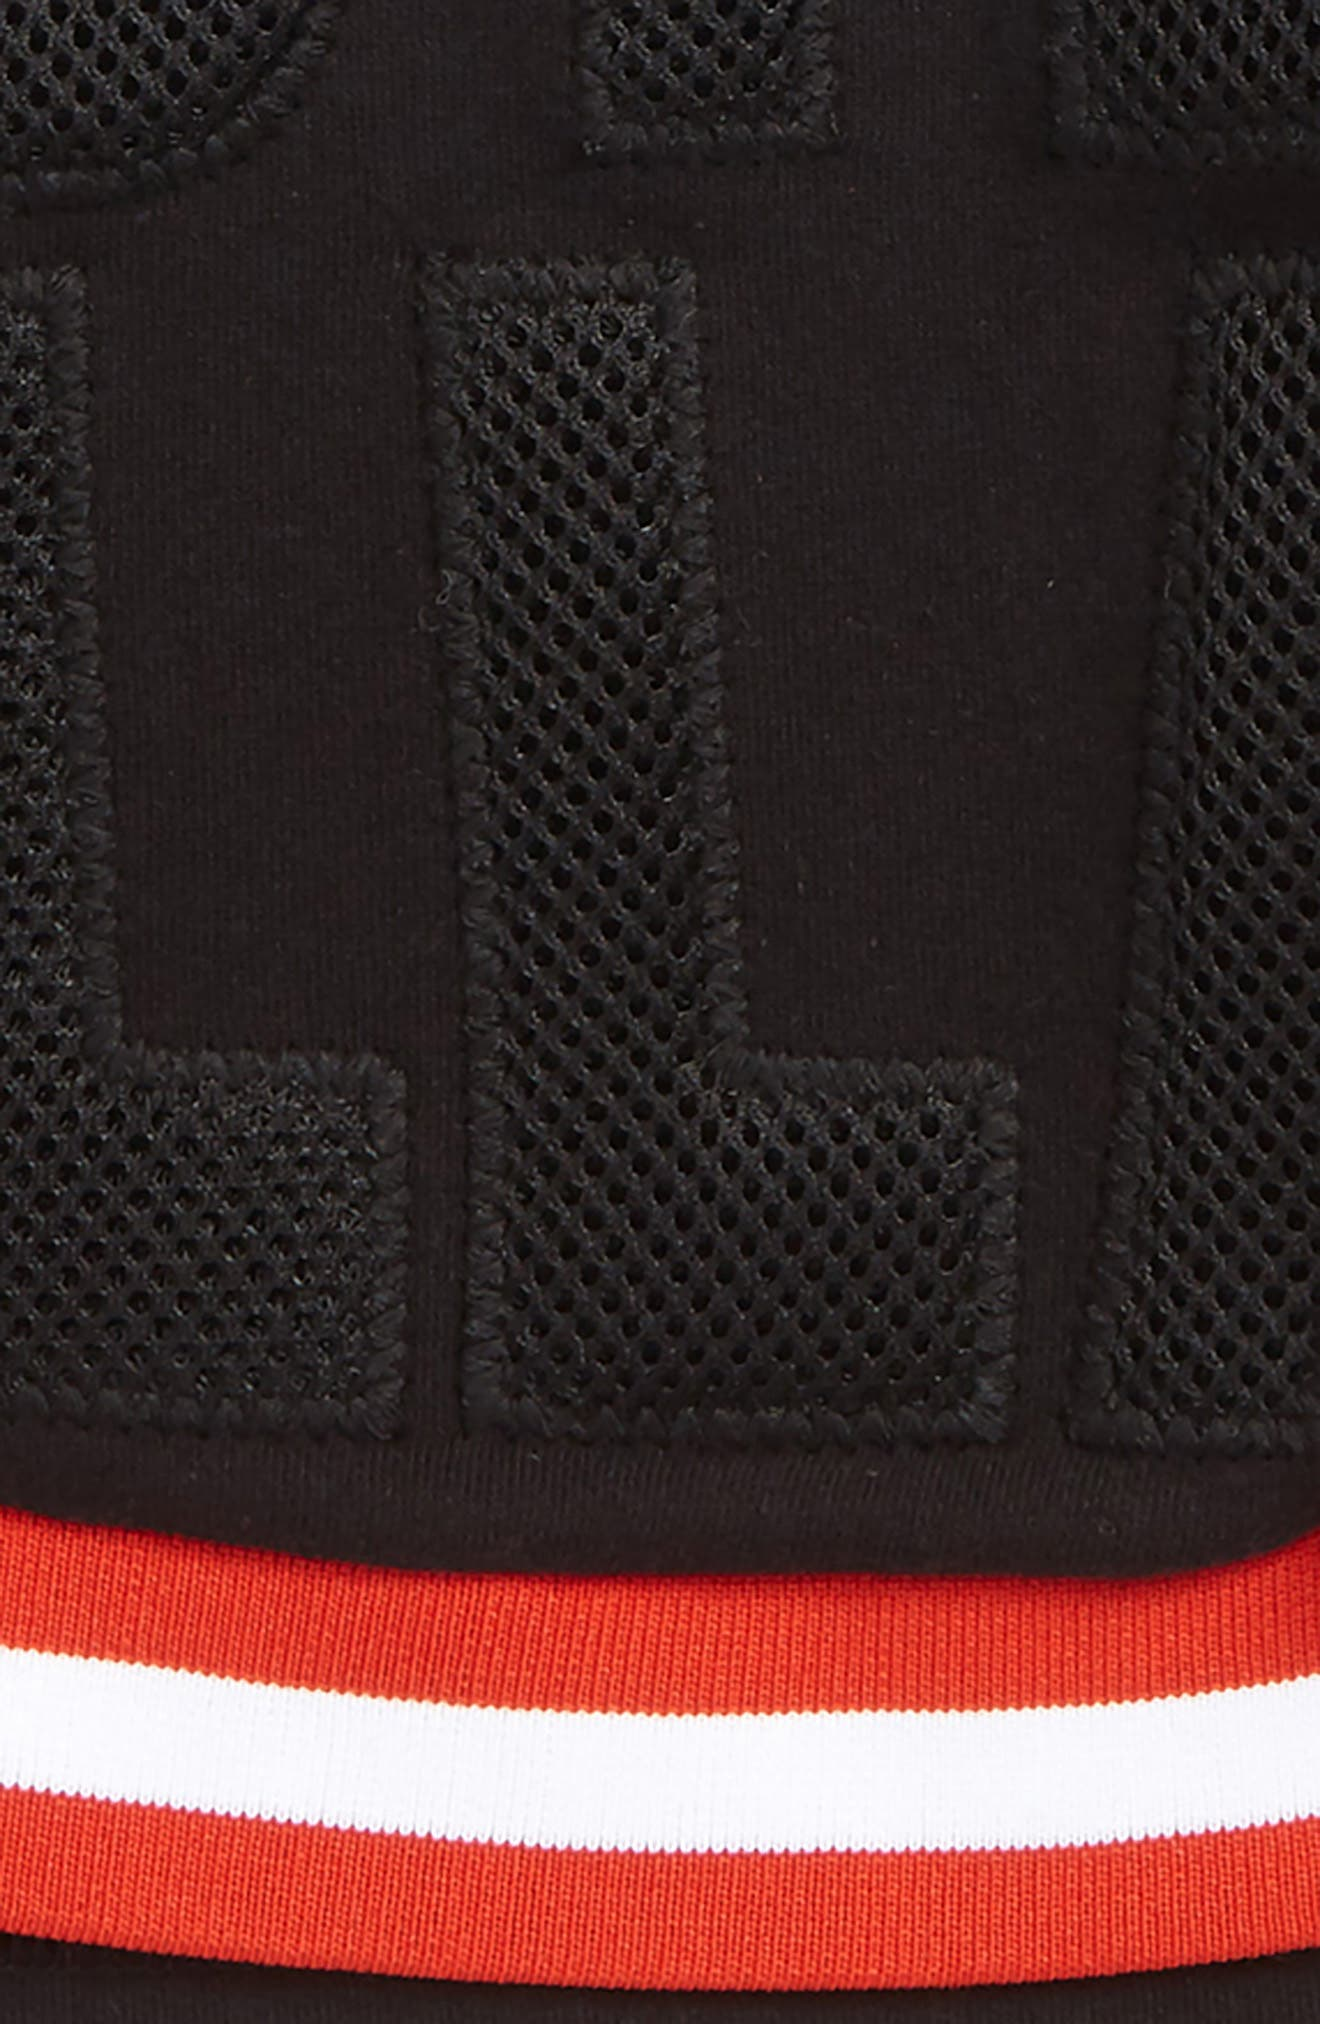 Daya Sweatshirt,                             Alternate thumbnail 2, color,                             Black